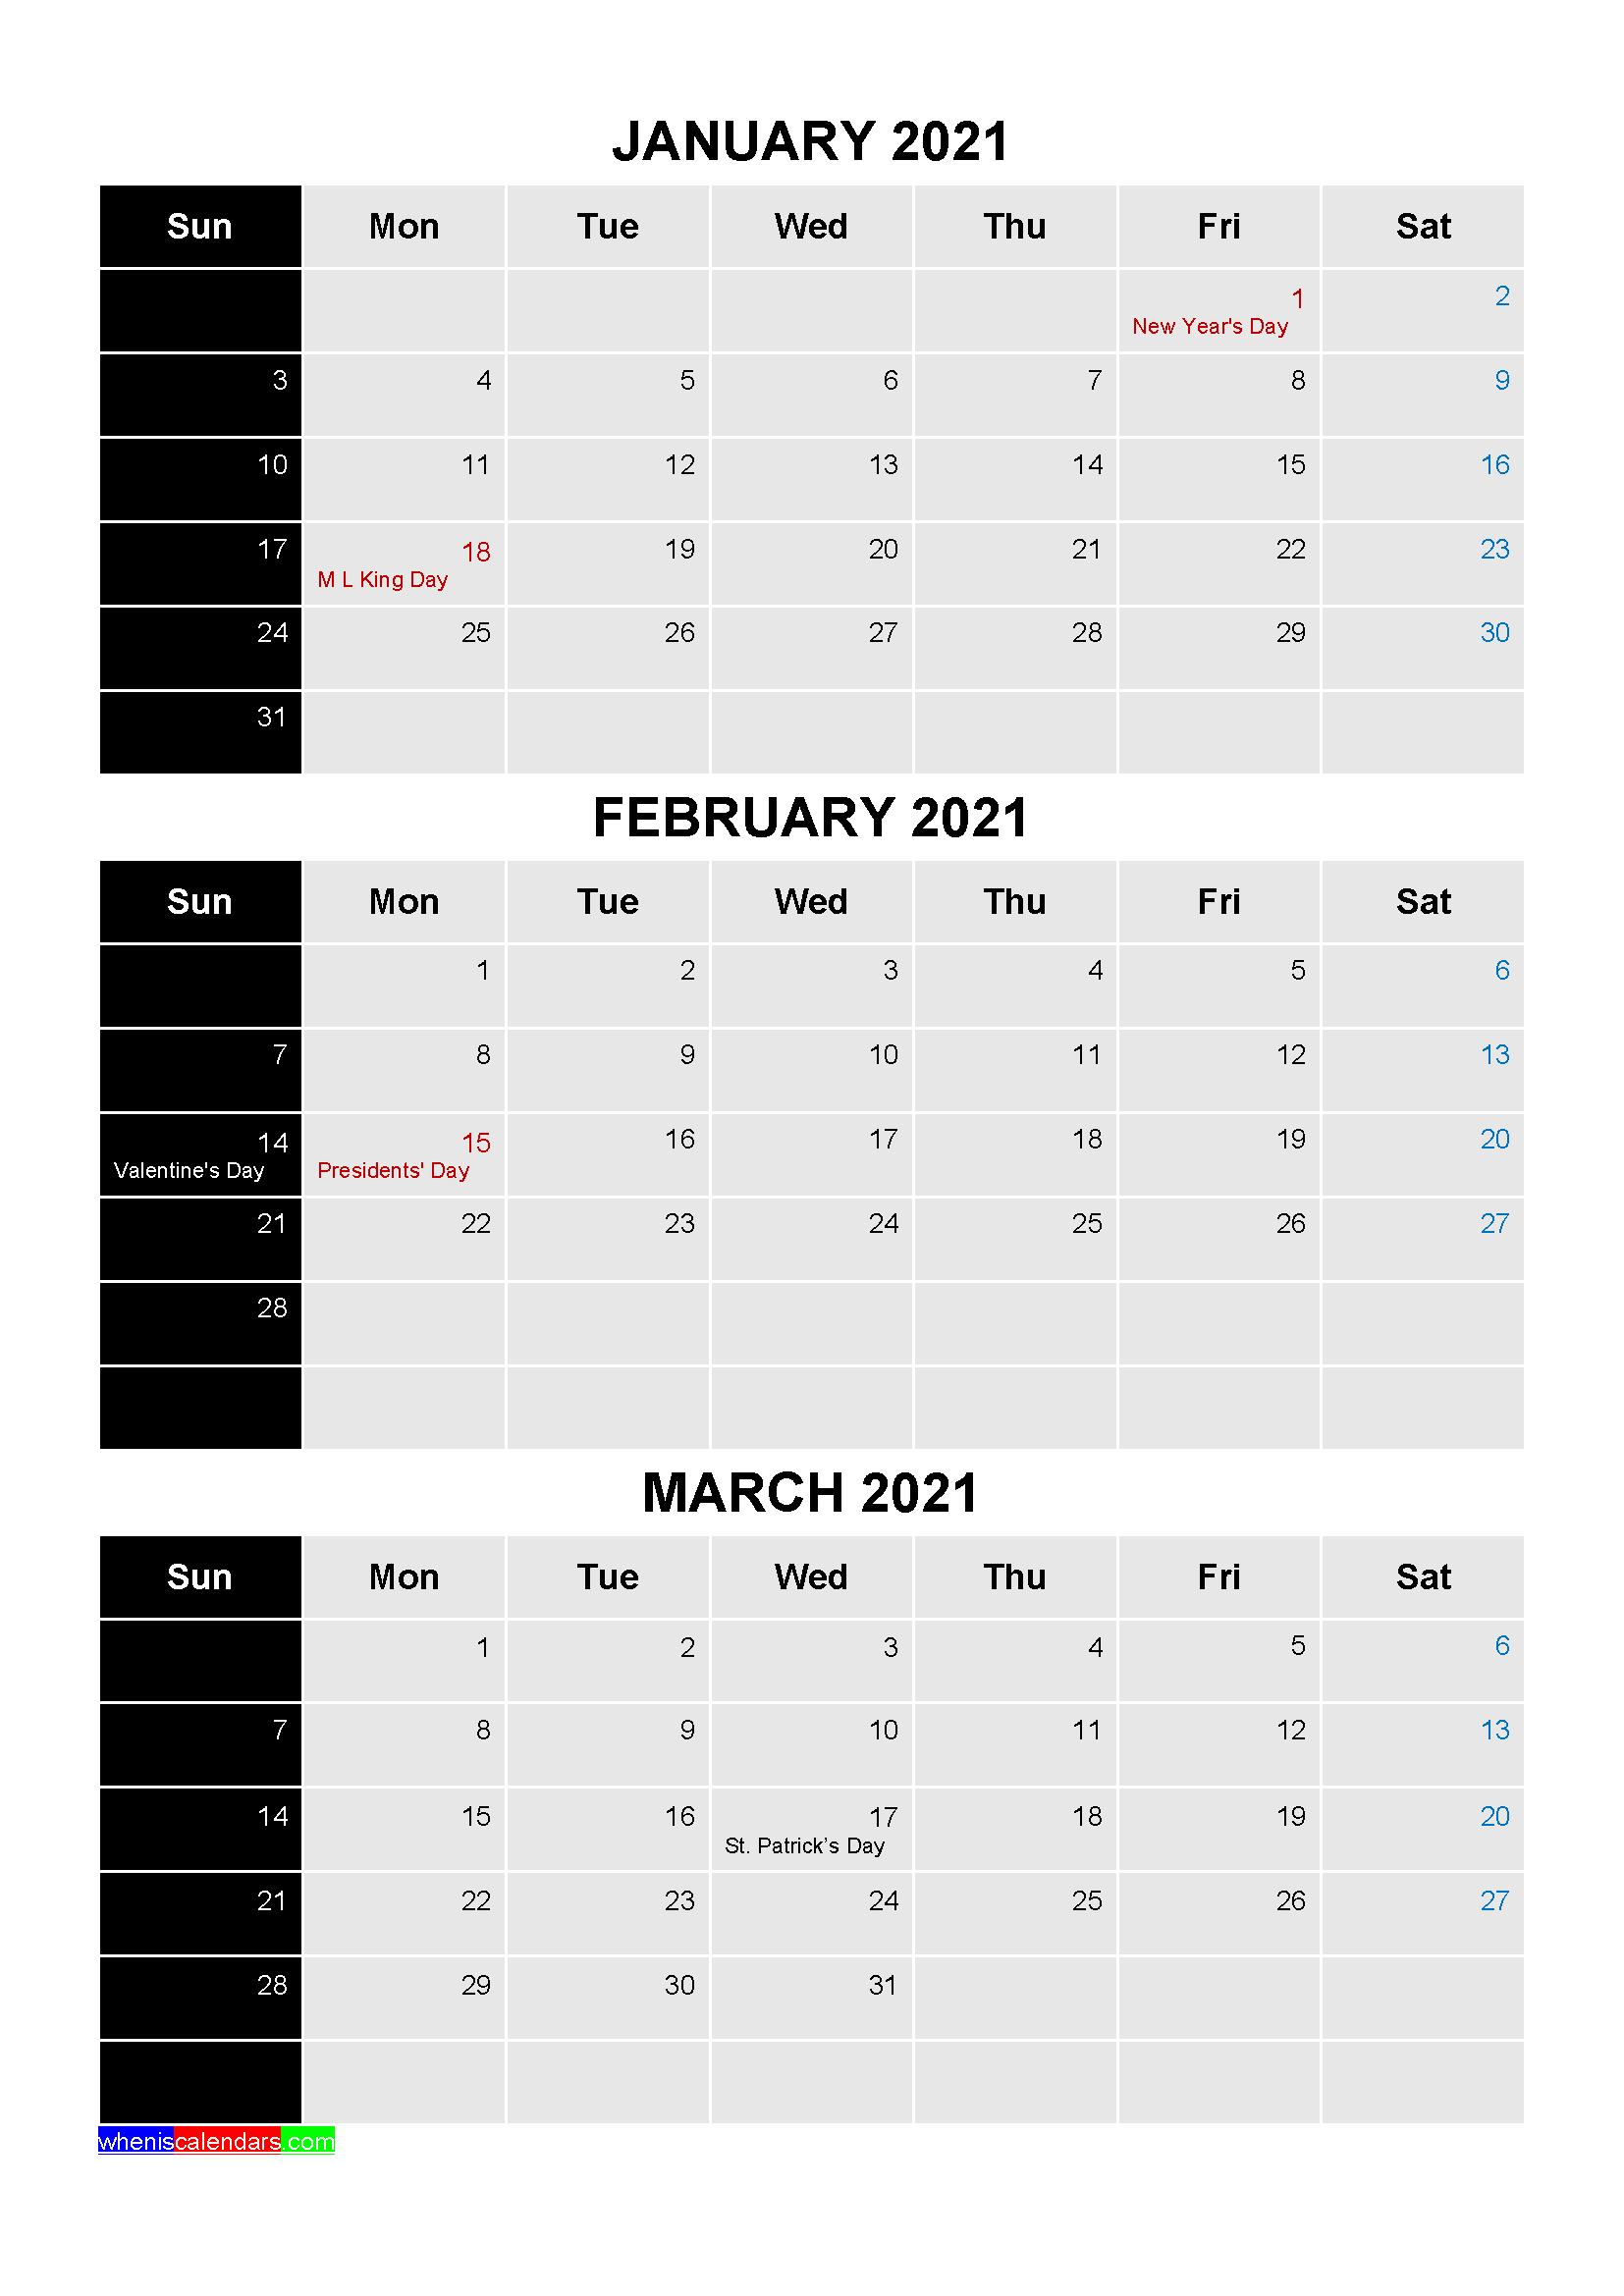 Free Printable January February March 2021 Calendar With With January February March 2021 Calendar